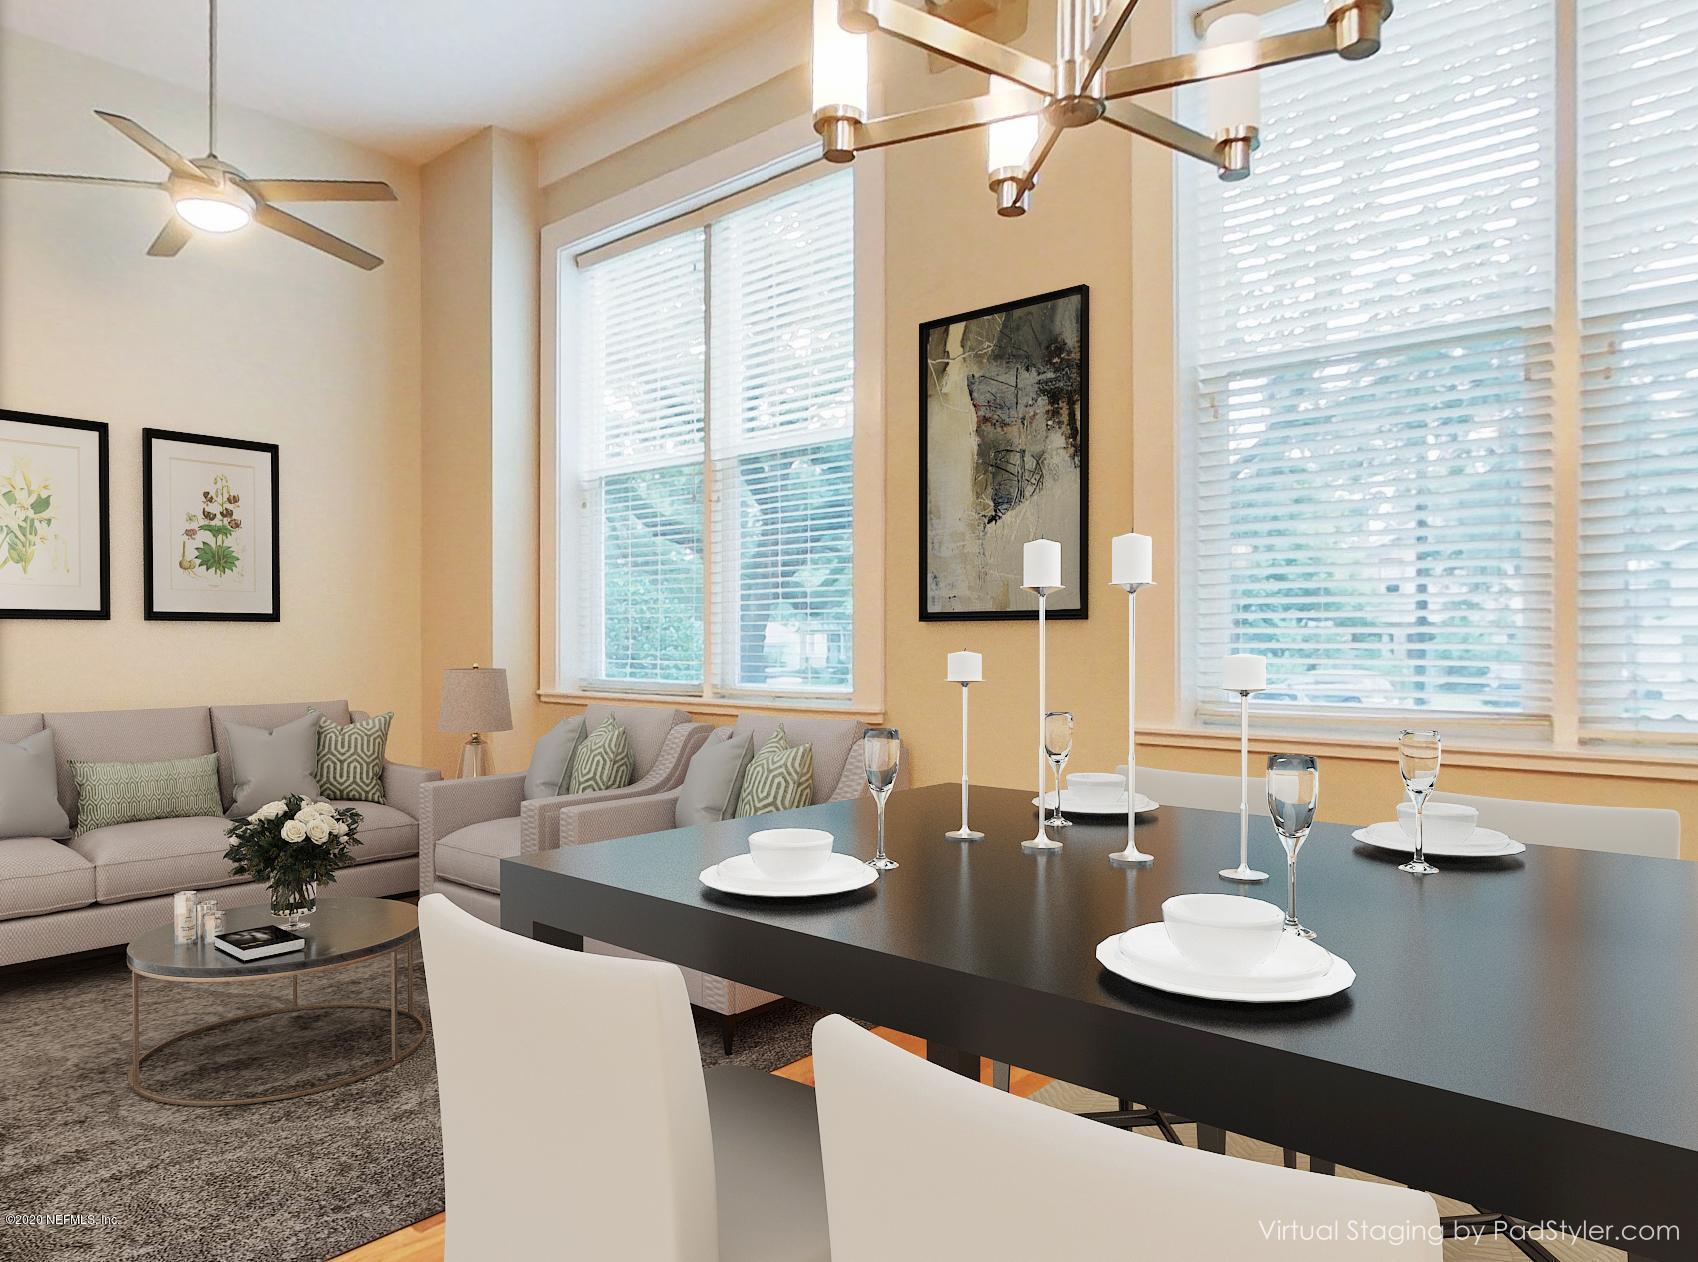 2525 COLLEGE, JACKSONVILLE, FLORIDA 32204, 2 Bedrooms Bedrooms, ,2 BathroomsBathrooms,Residential,For sale,COLLEGE,1055886